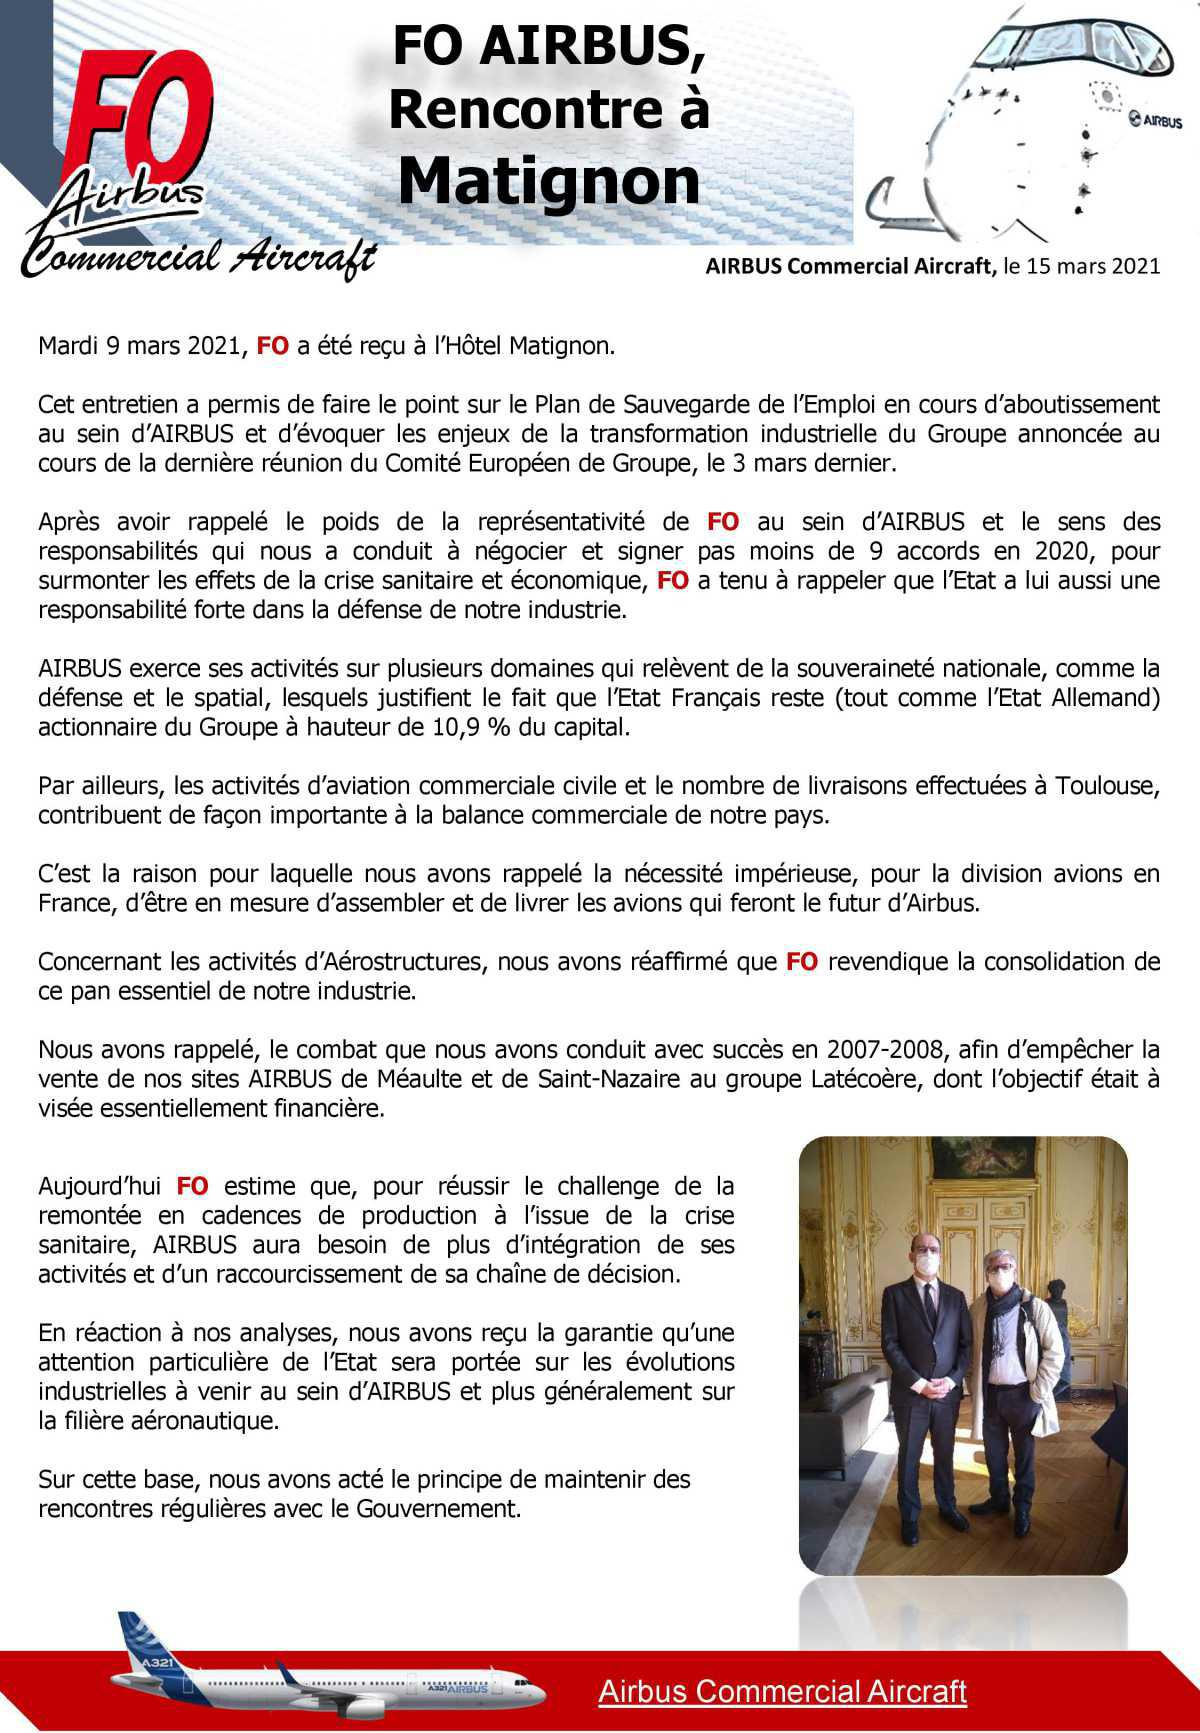 FO Airbus reçu à Matignon